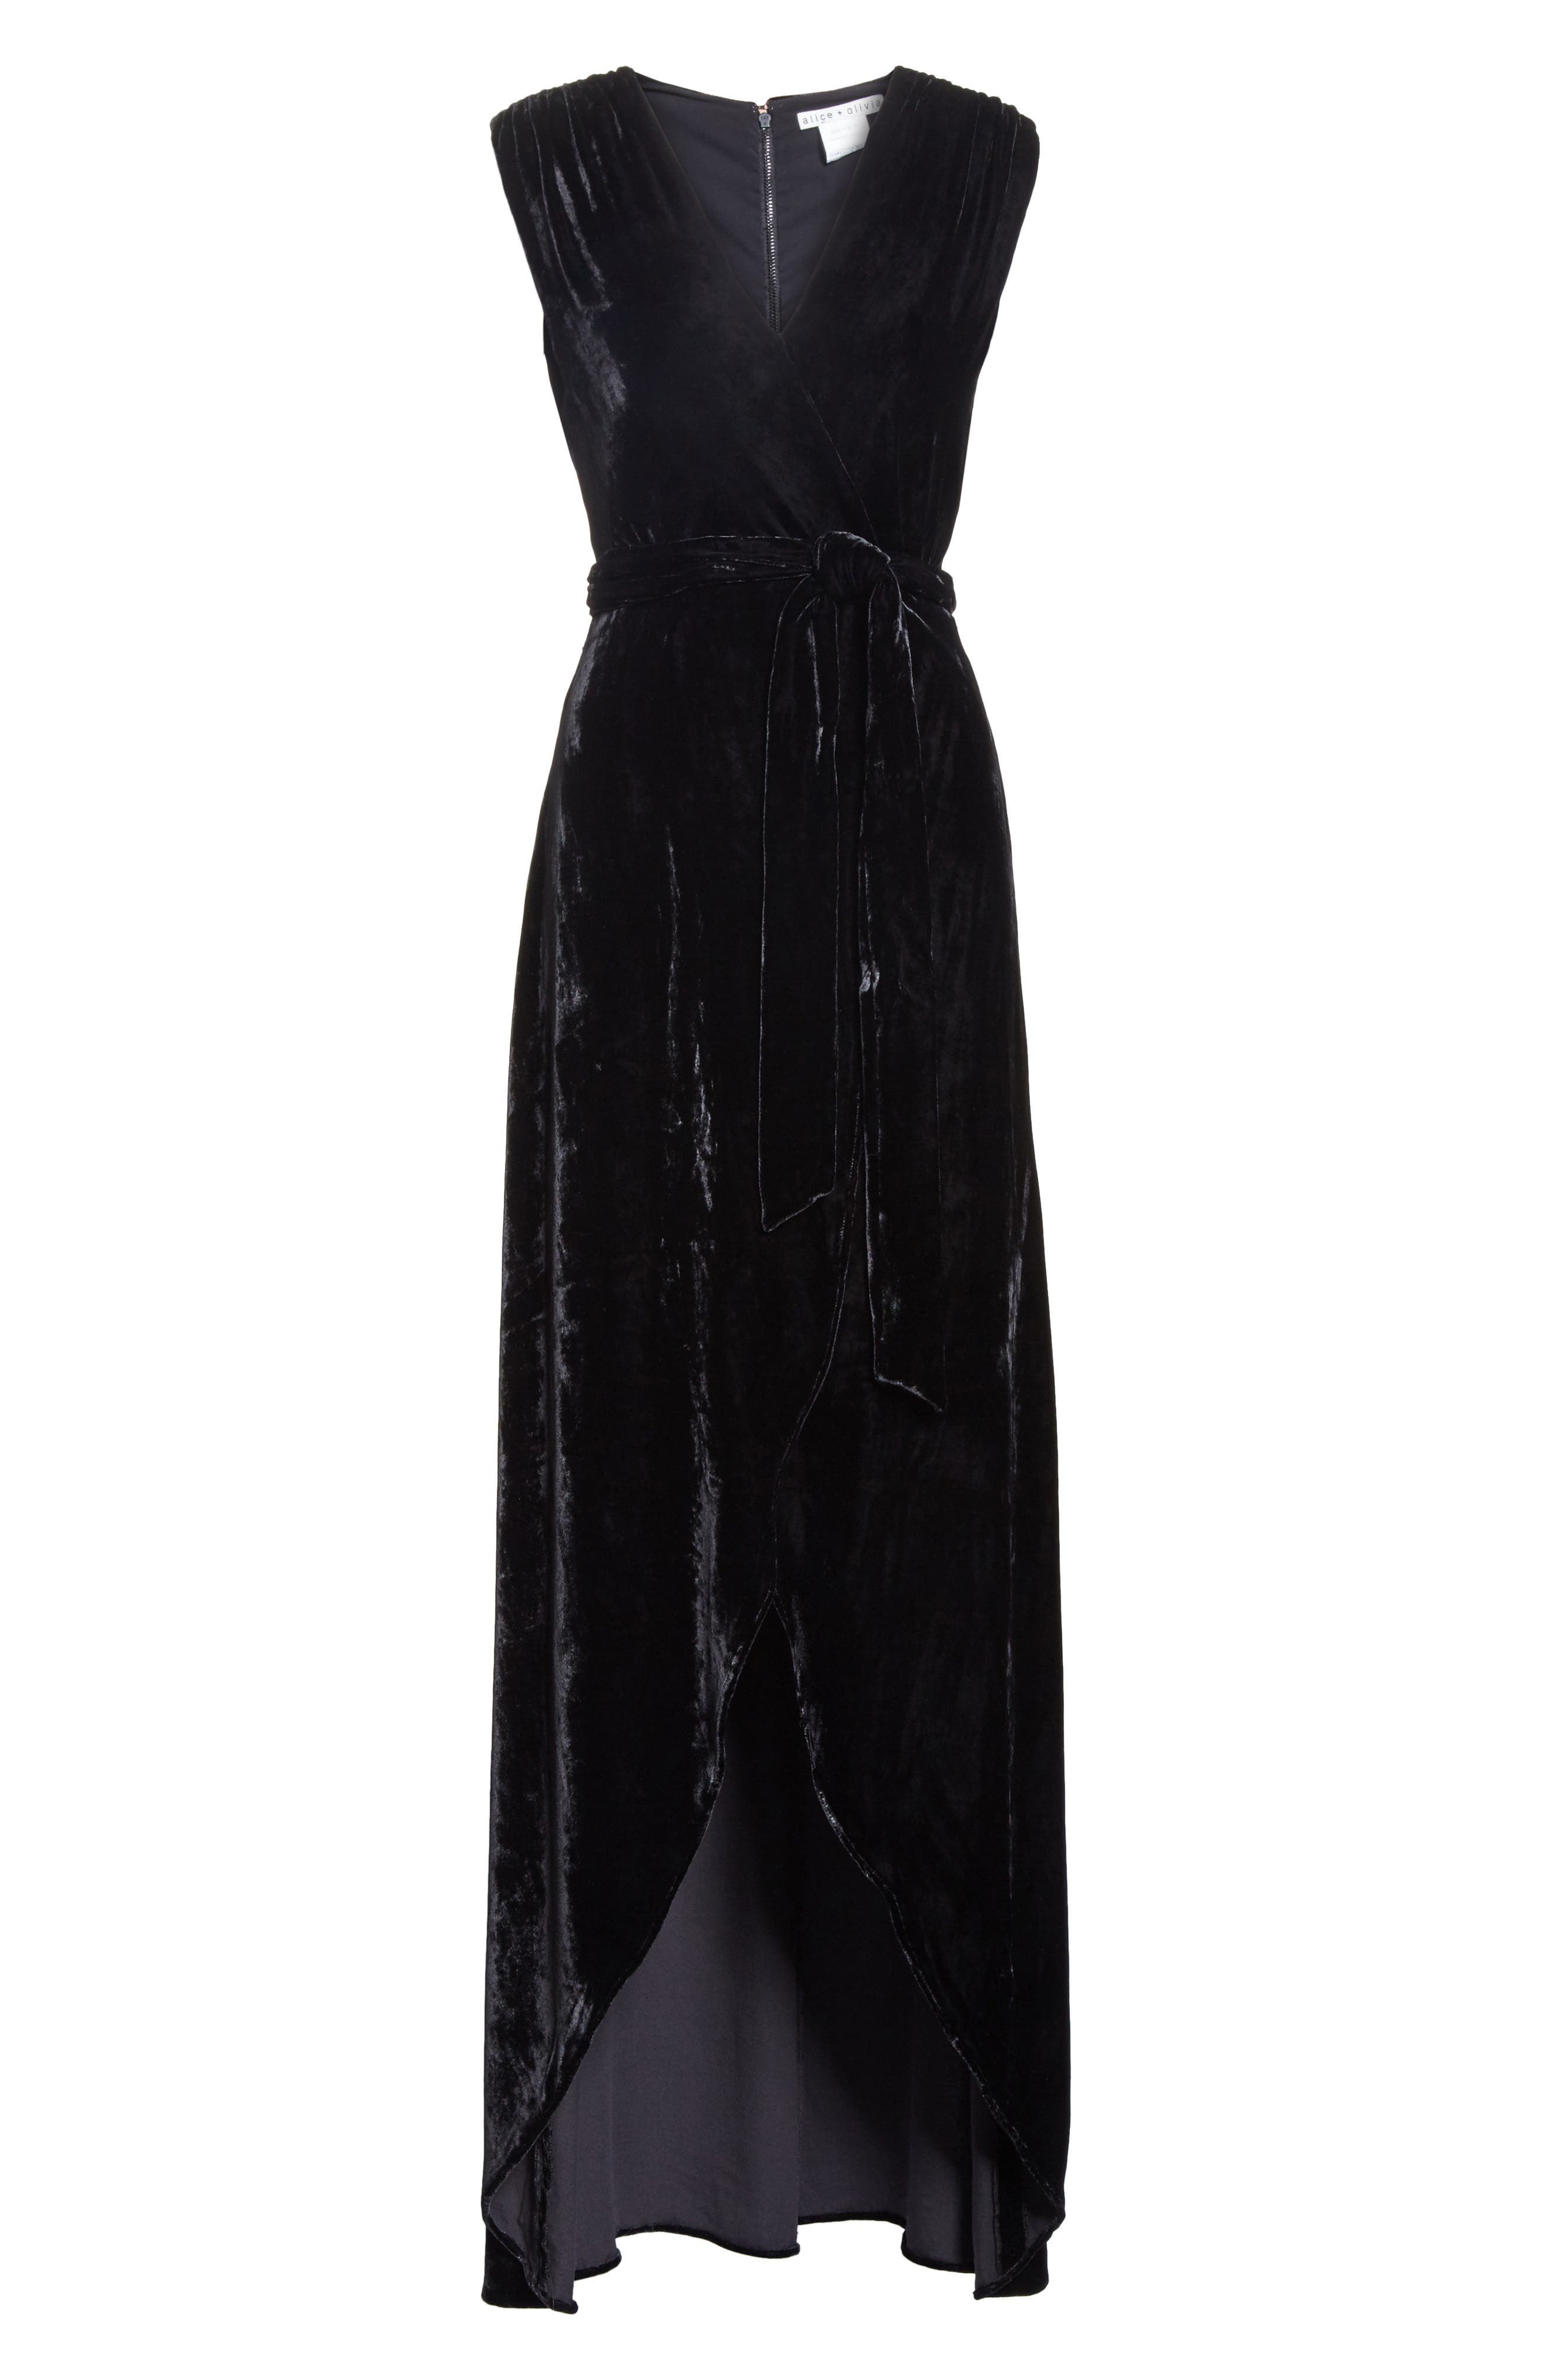 Simmons Velvet Wrap Maxi Dress,                             Alternate thumbnail 6, color,                             001